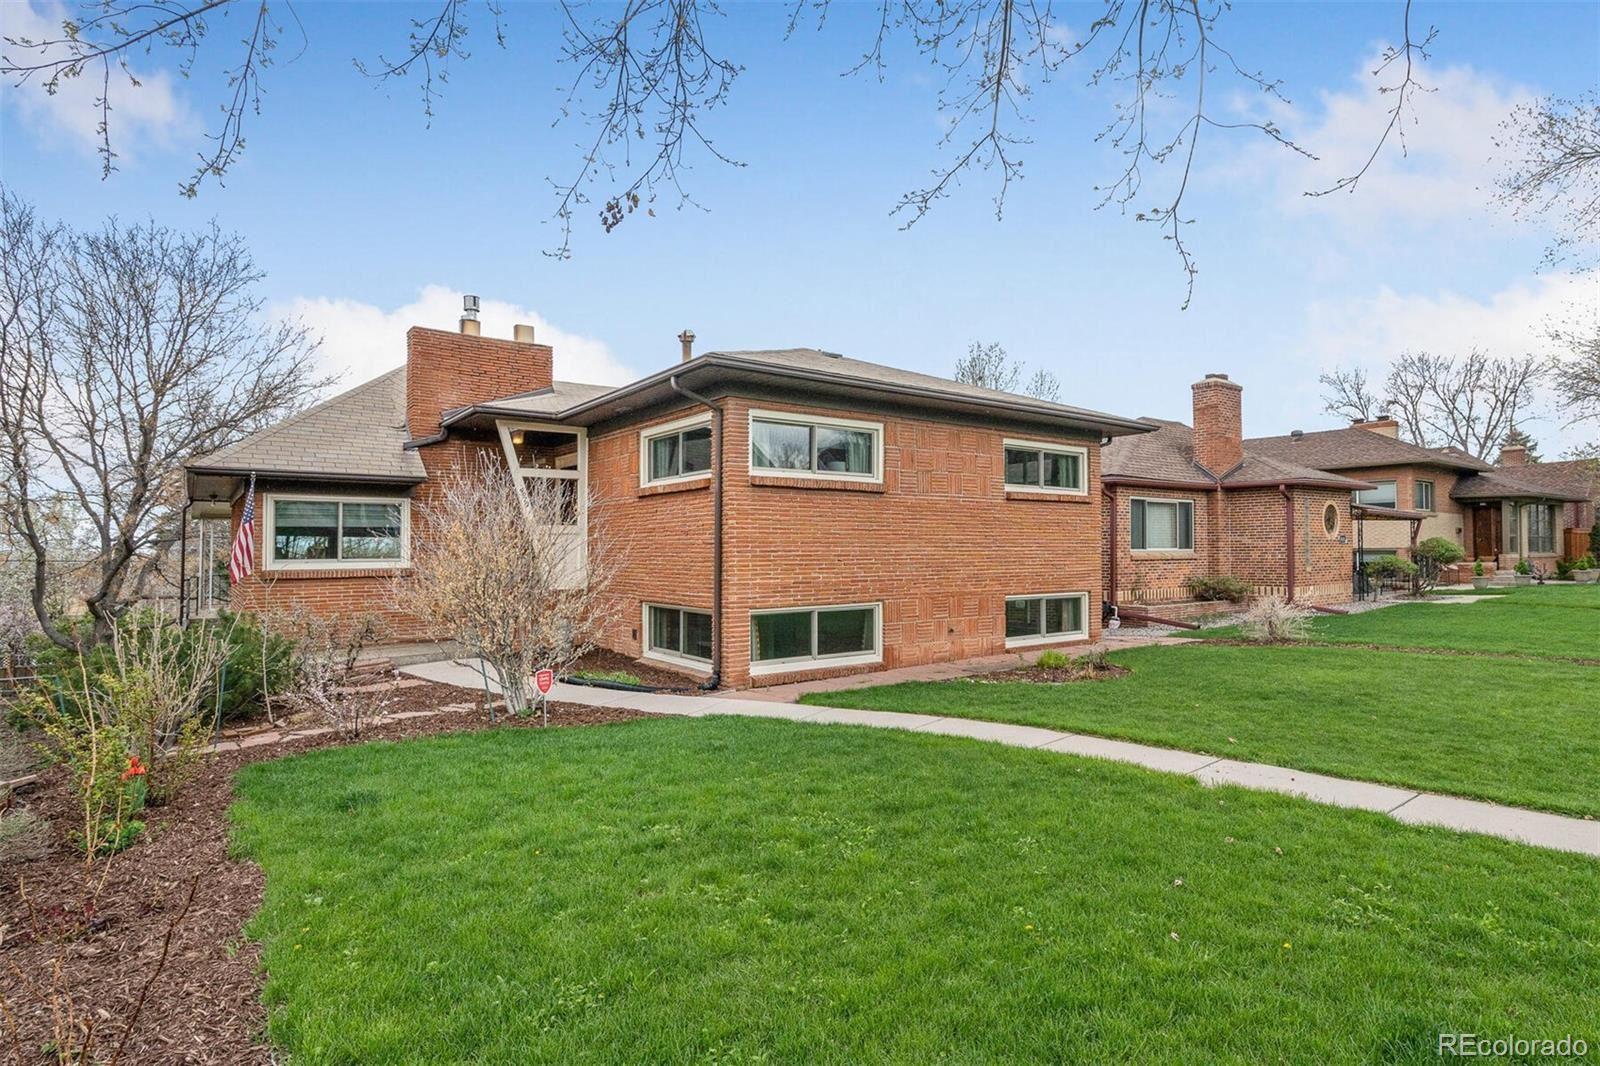 Photo of 4910 W 31st Avenue, Denver, CO 80212 (MLS # 5931368)